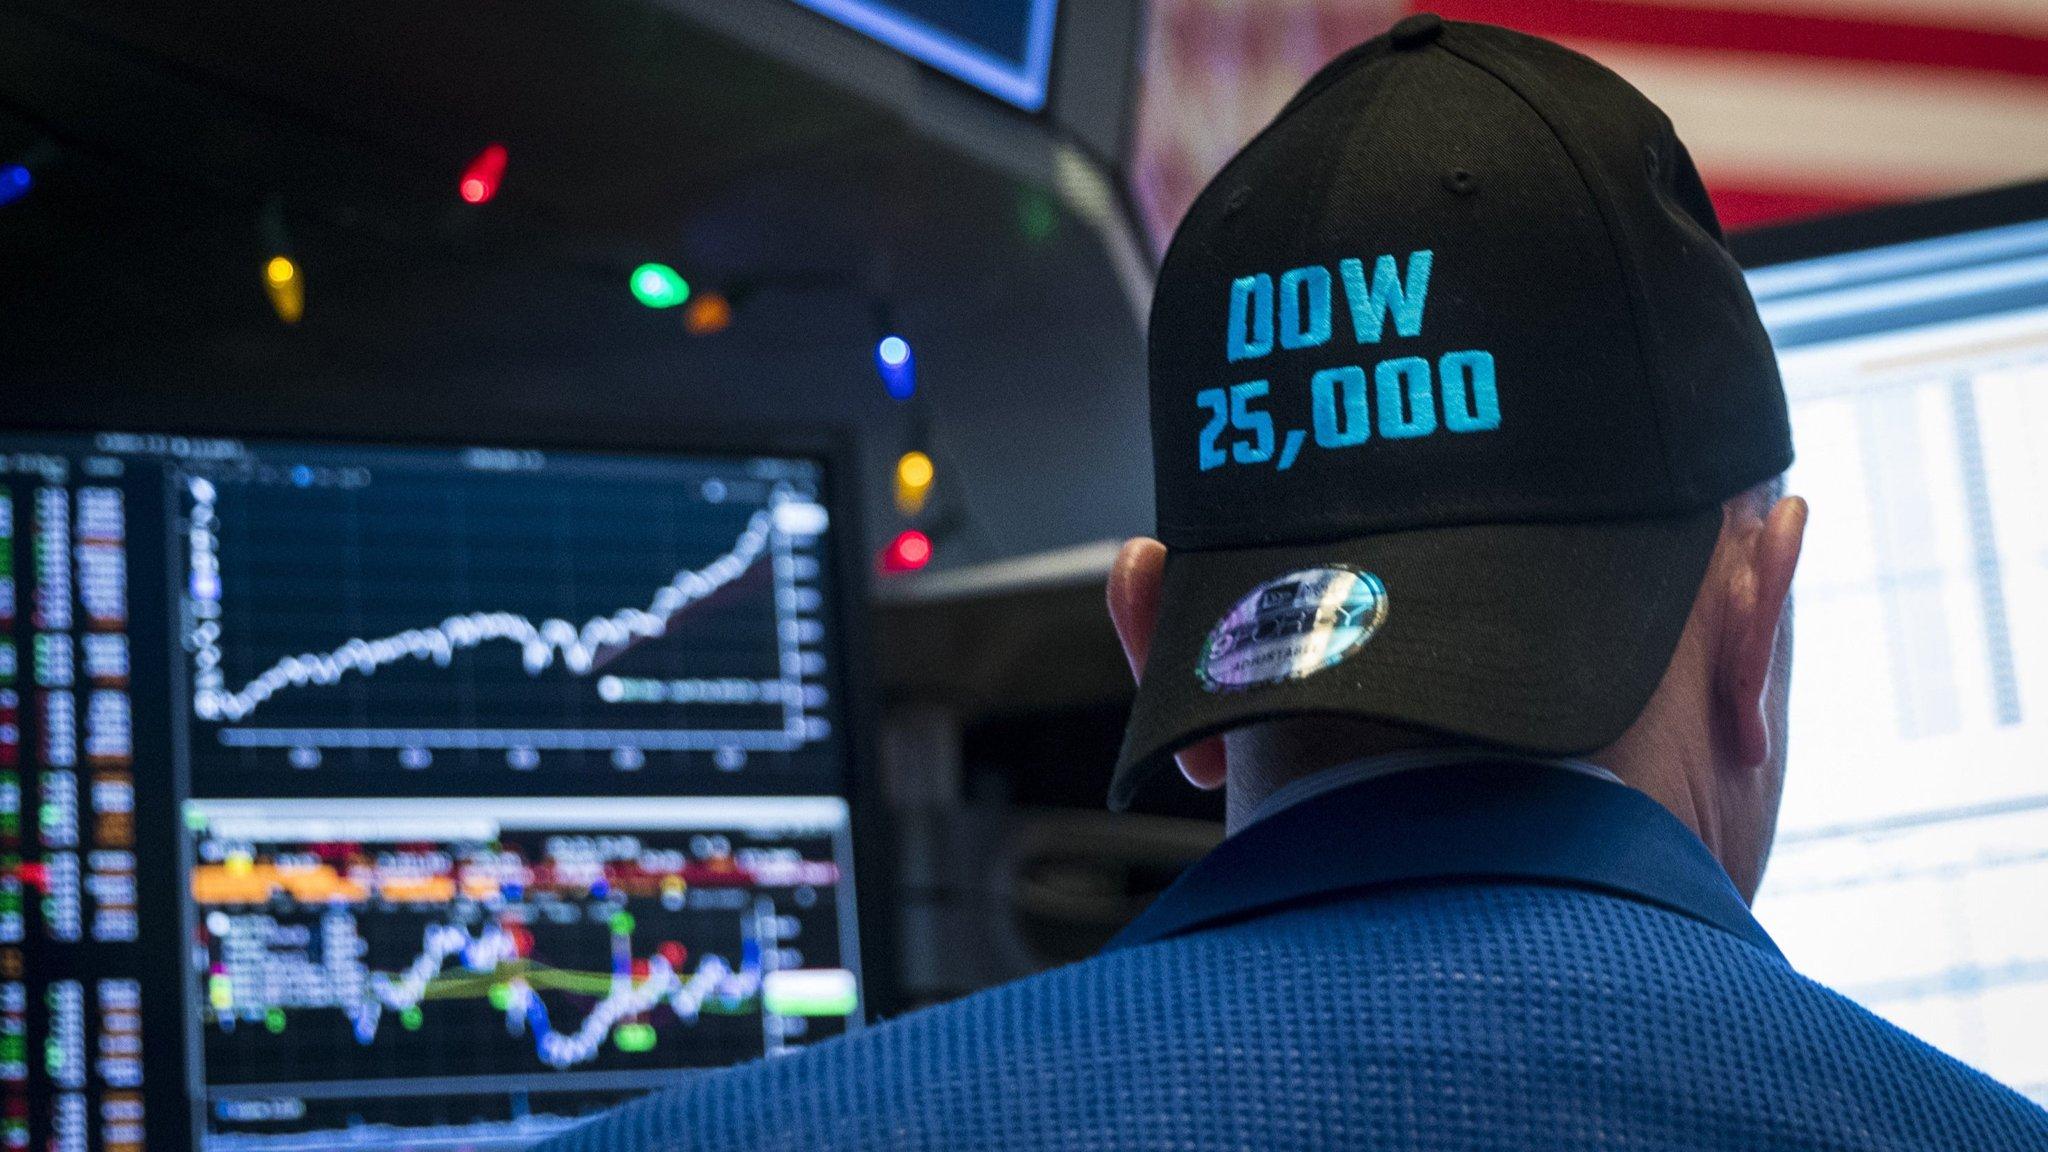 Dow surge past 25,000 lifts Asian markets